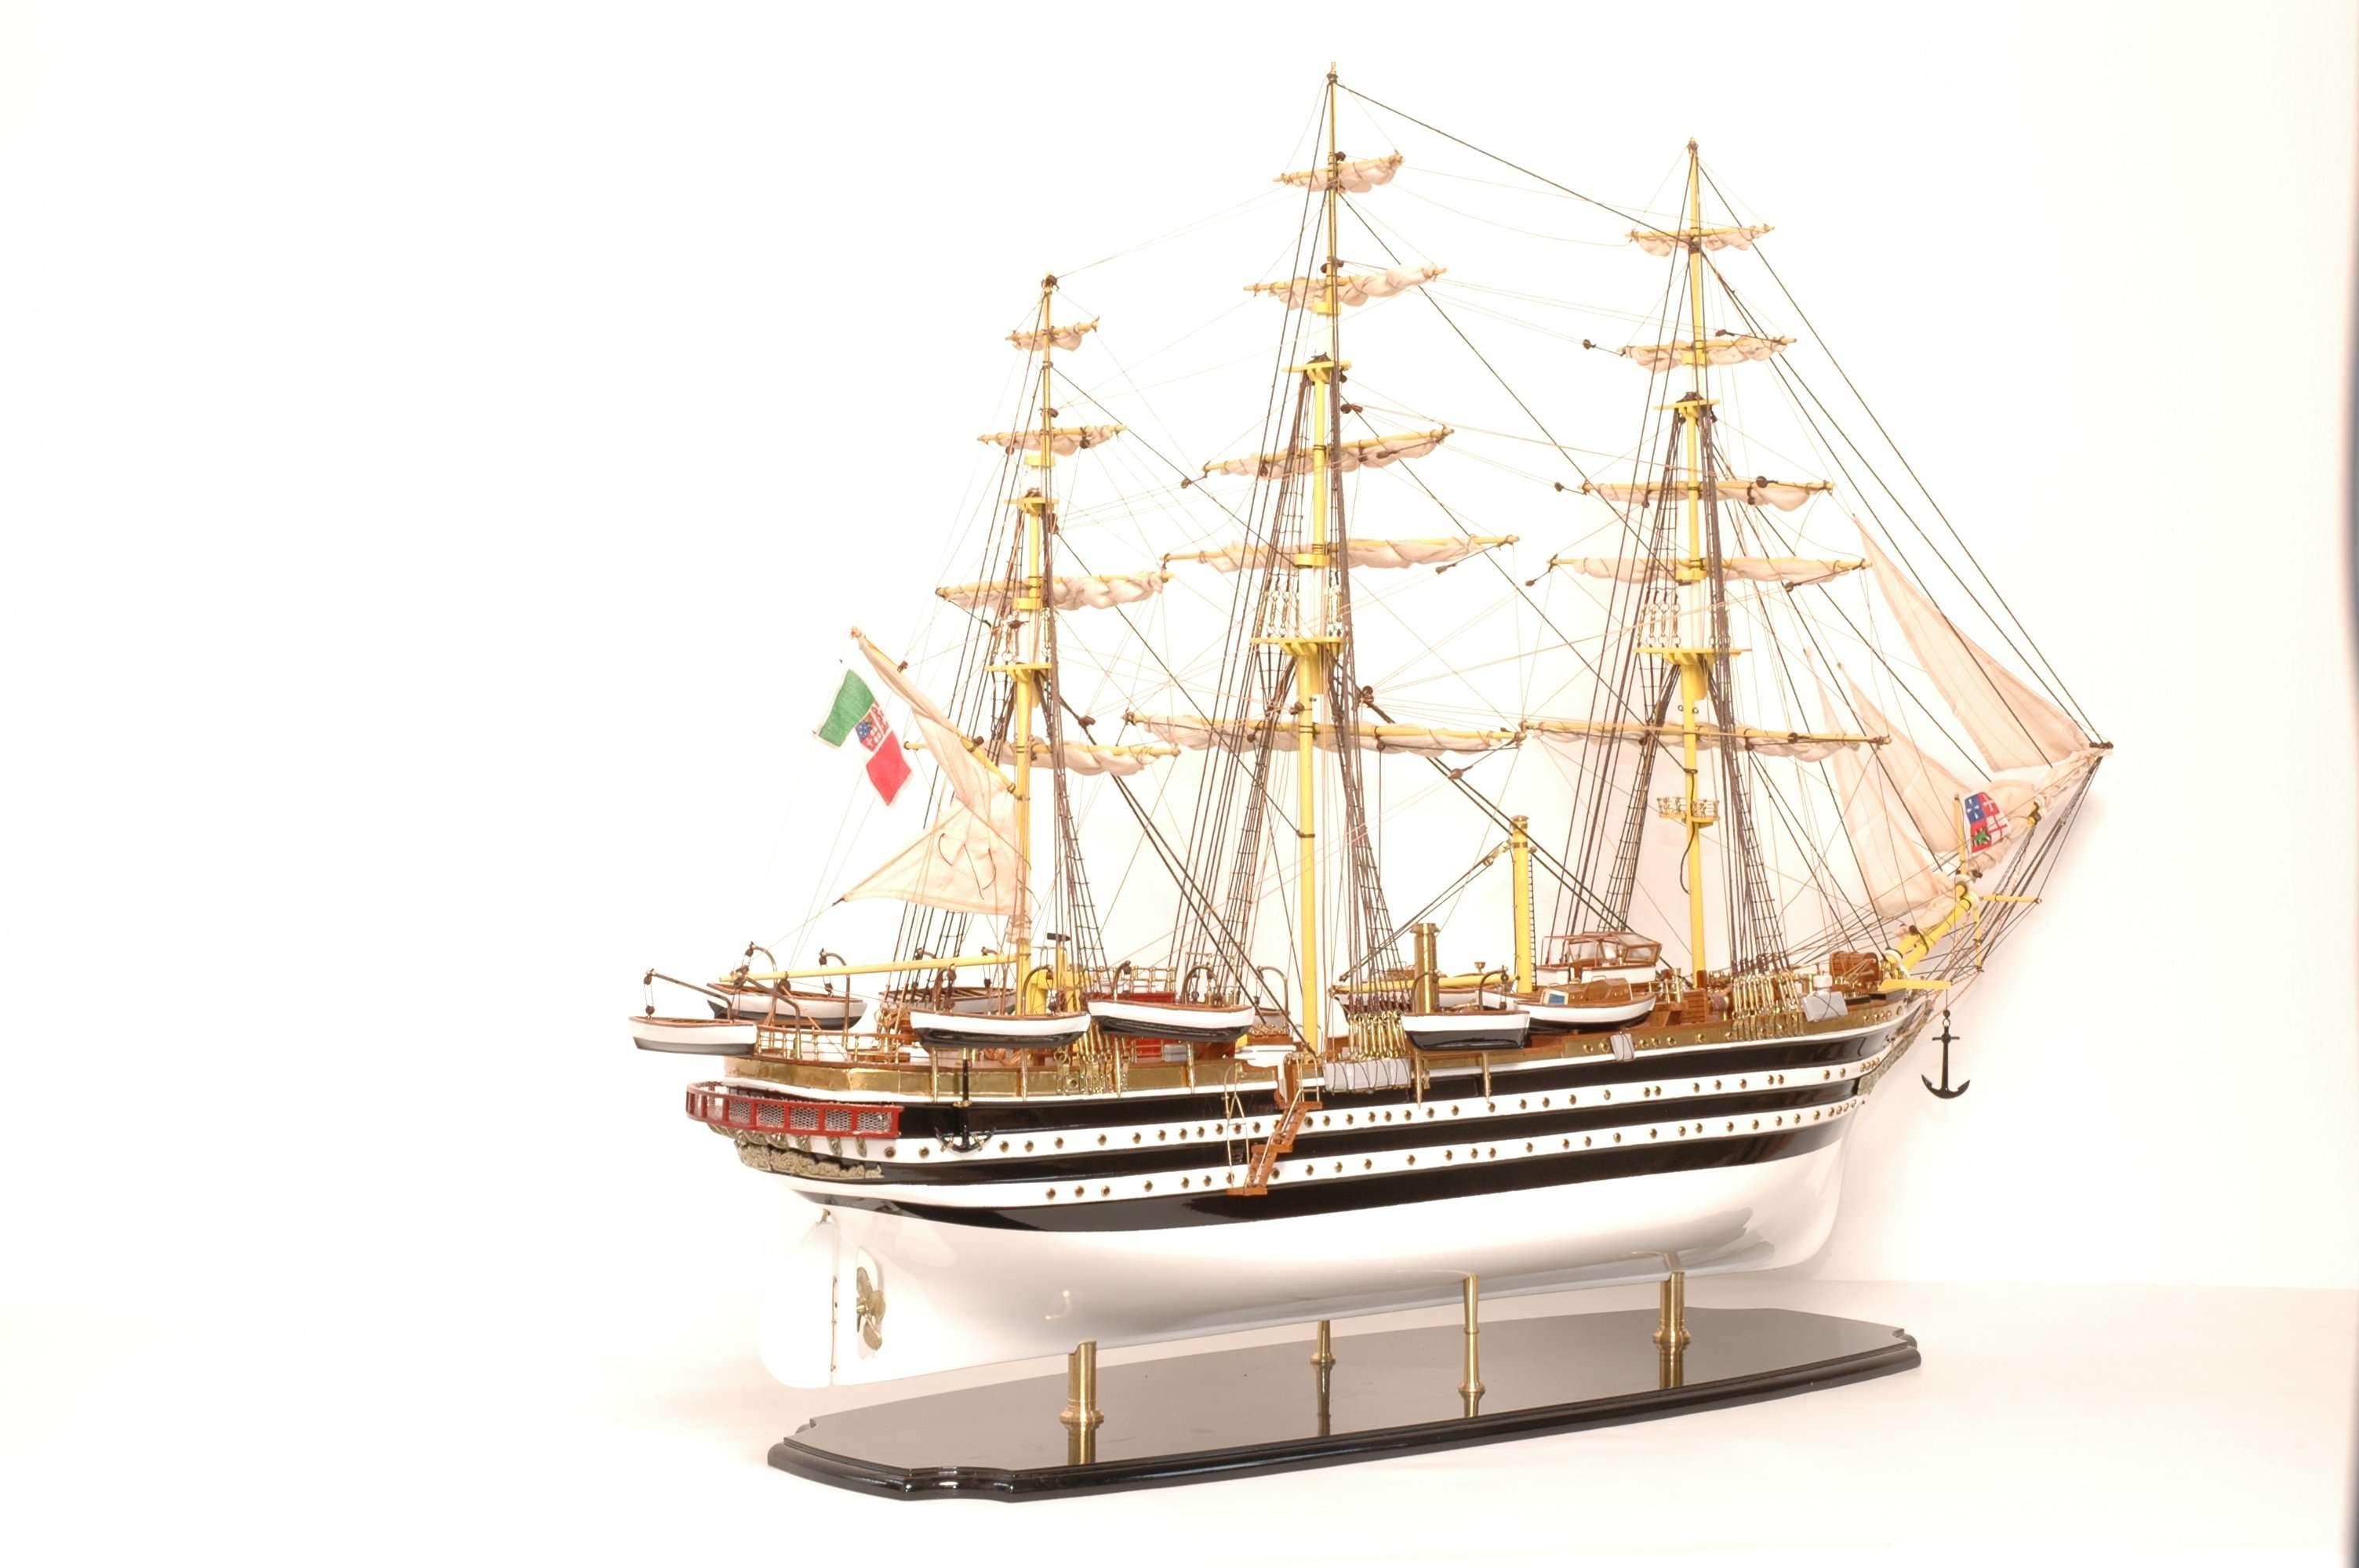 498-4221-Amerigo-Vespucci-Model-Ship-Superior-Range